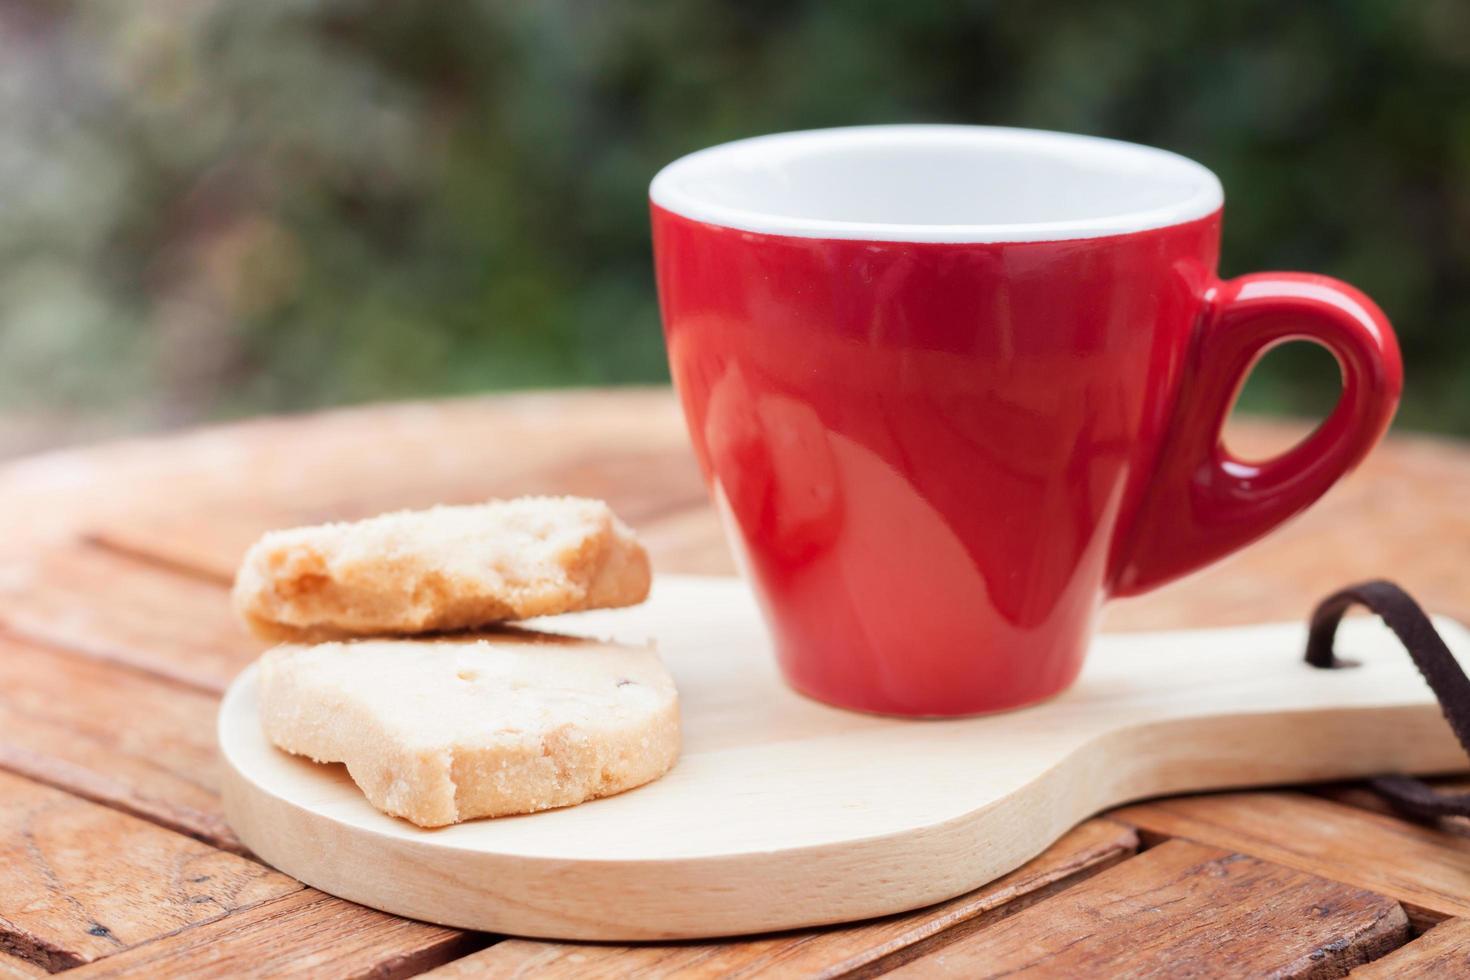 cashewkakor med en kaffekopp foto